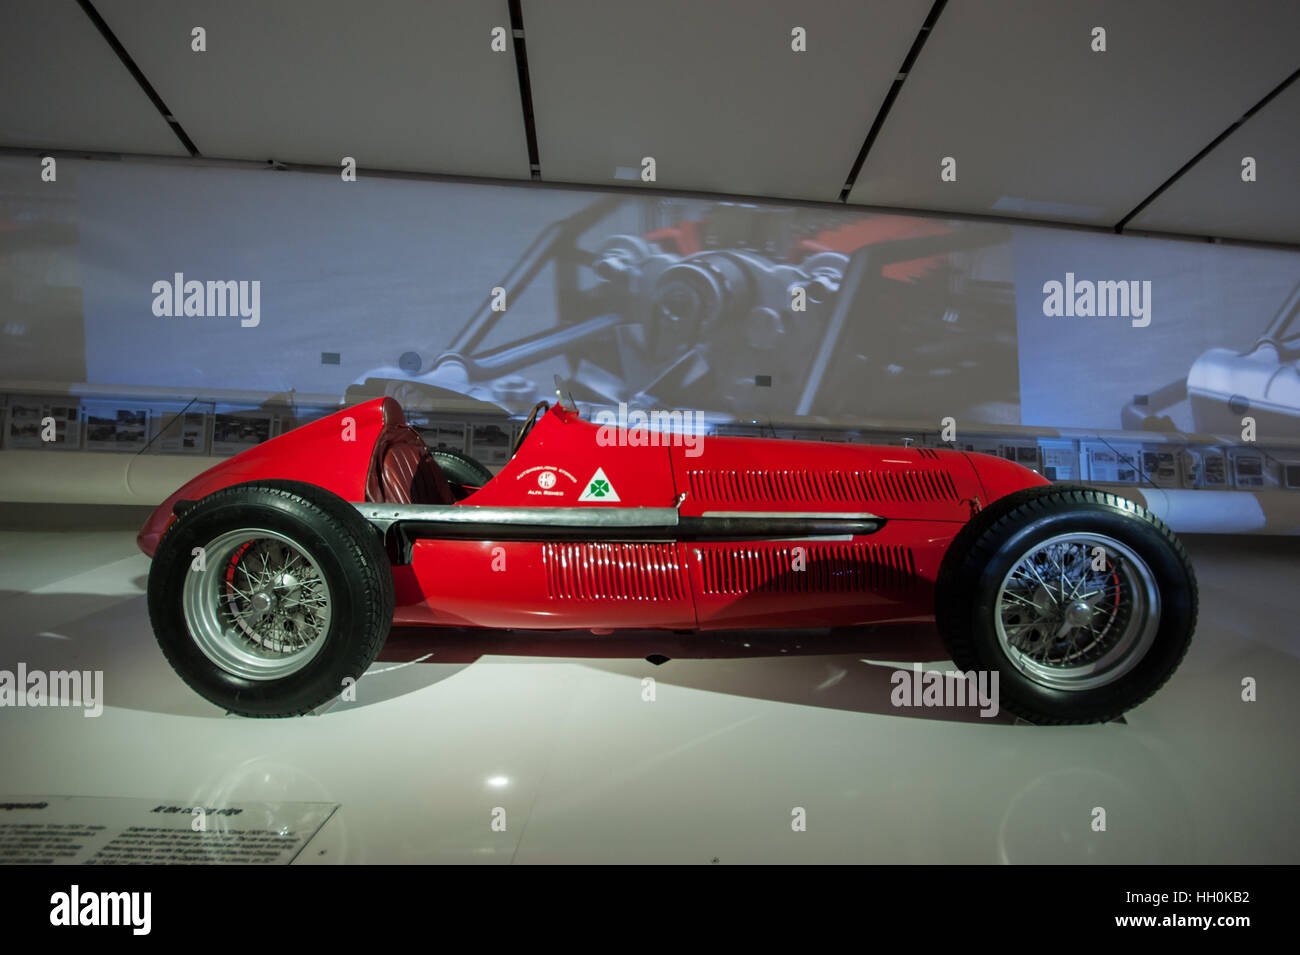 A 1937 Alfa Romeo 158 Alfetta vintage Formula One racing car pictured at the Ferrari Museum in Modena Inexhibit - Stock Image